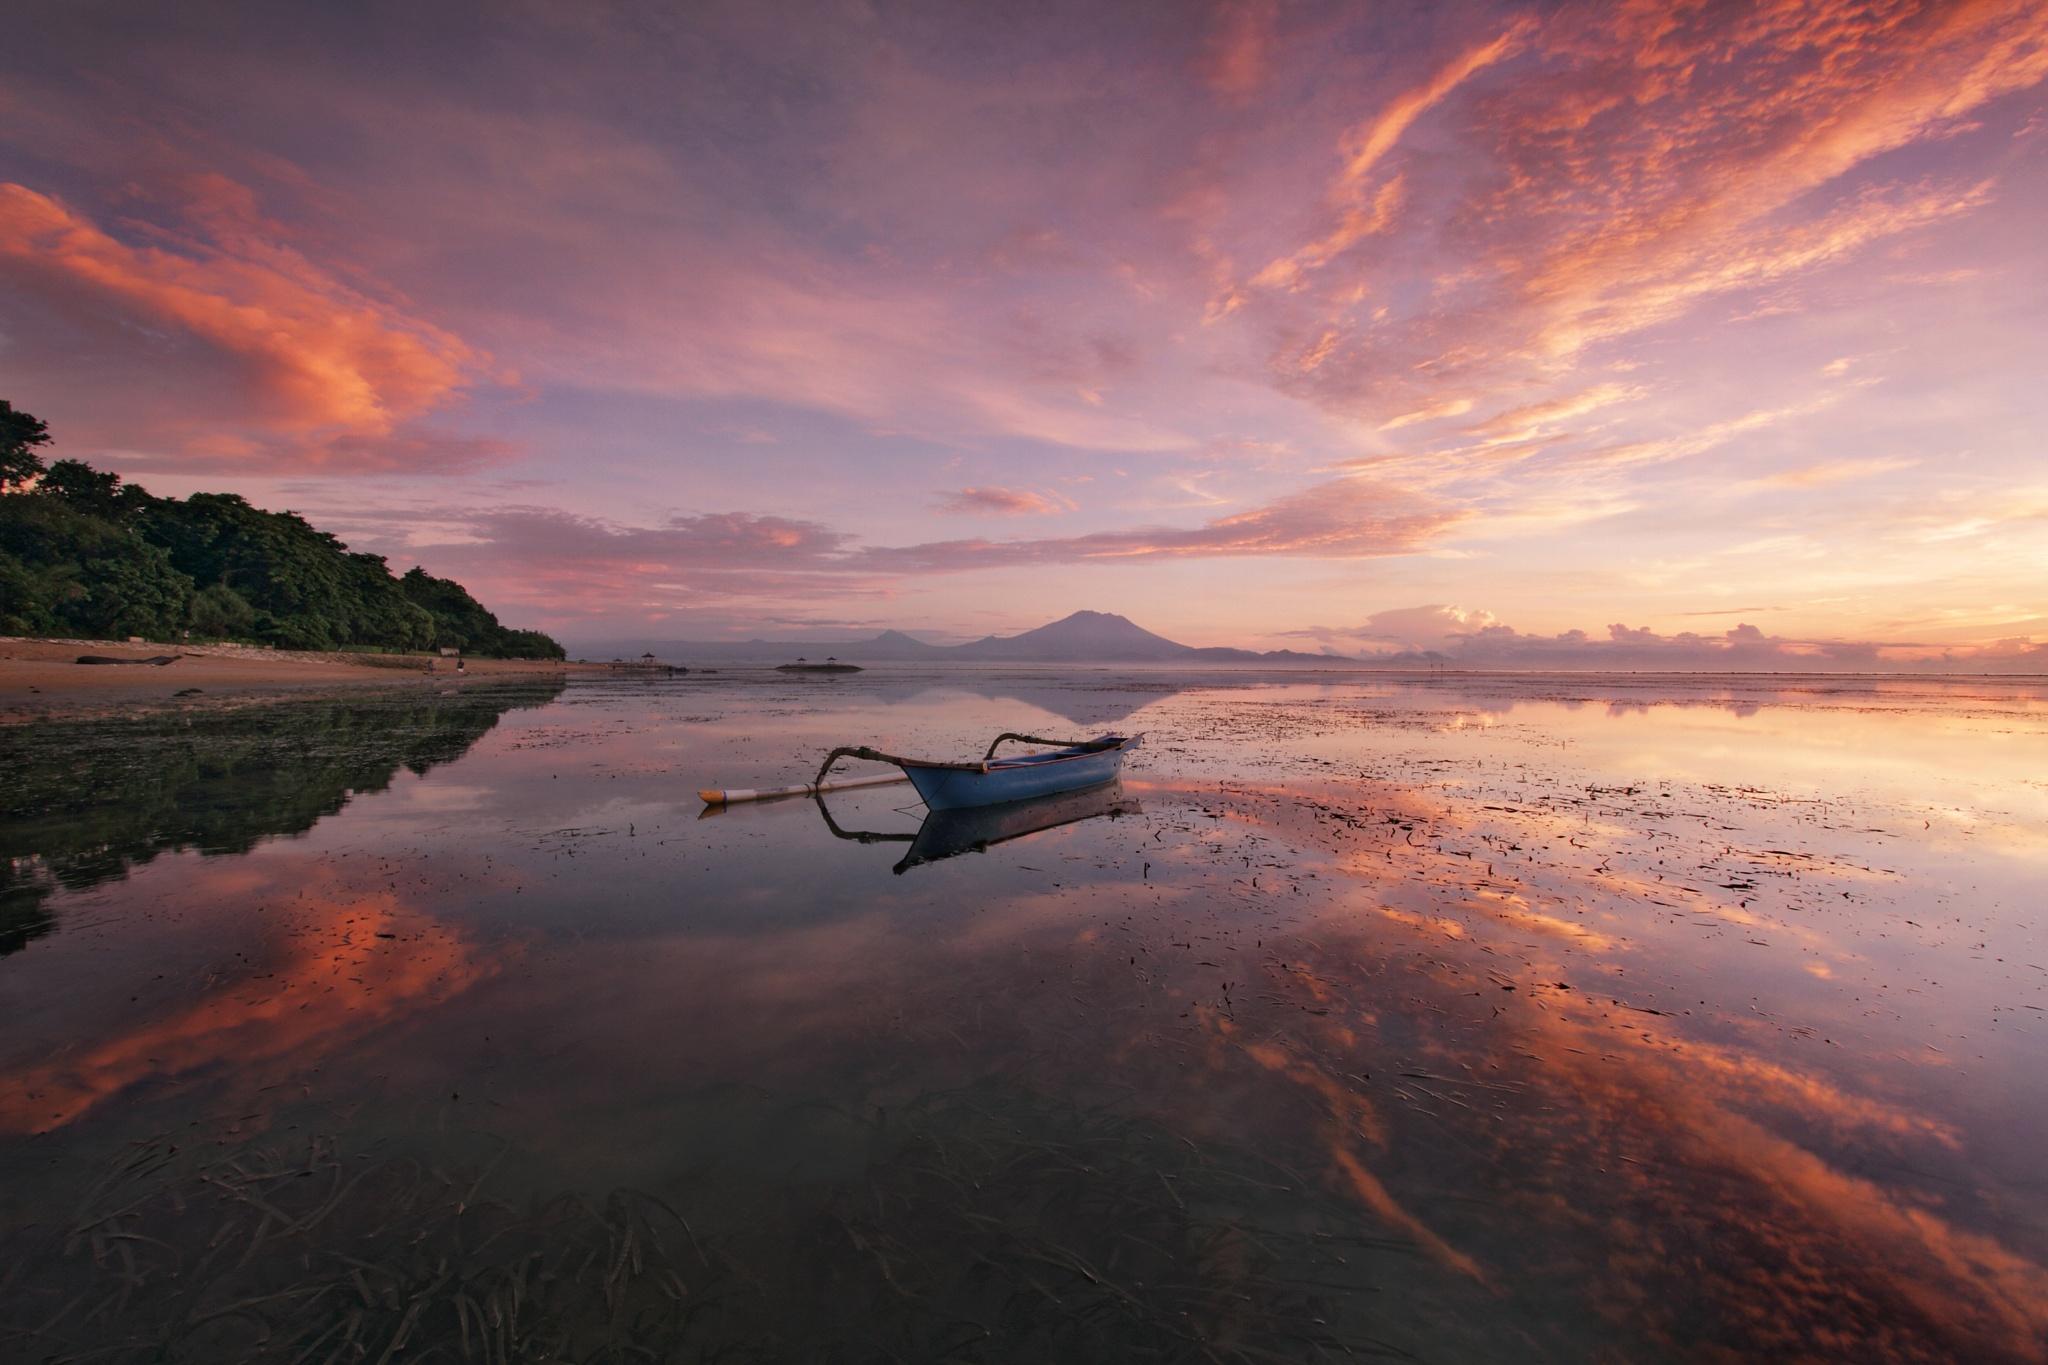 Karang Beach by Gede Widiarsa